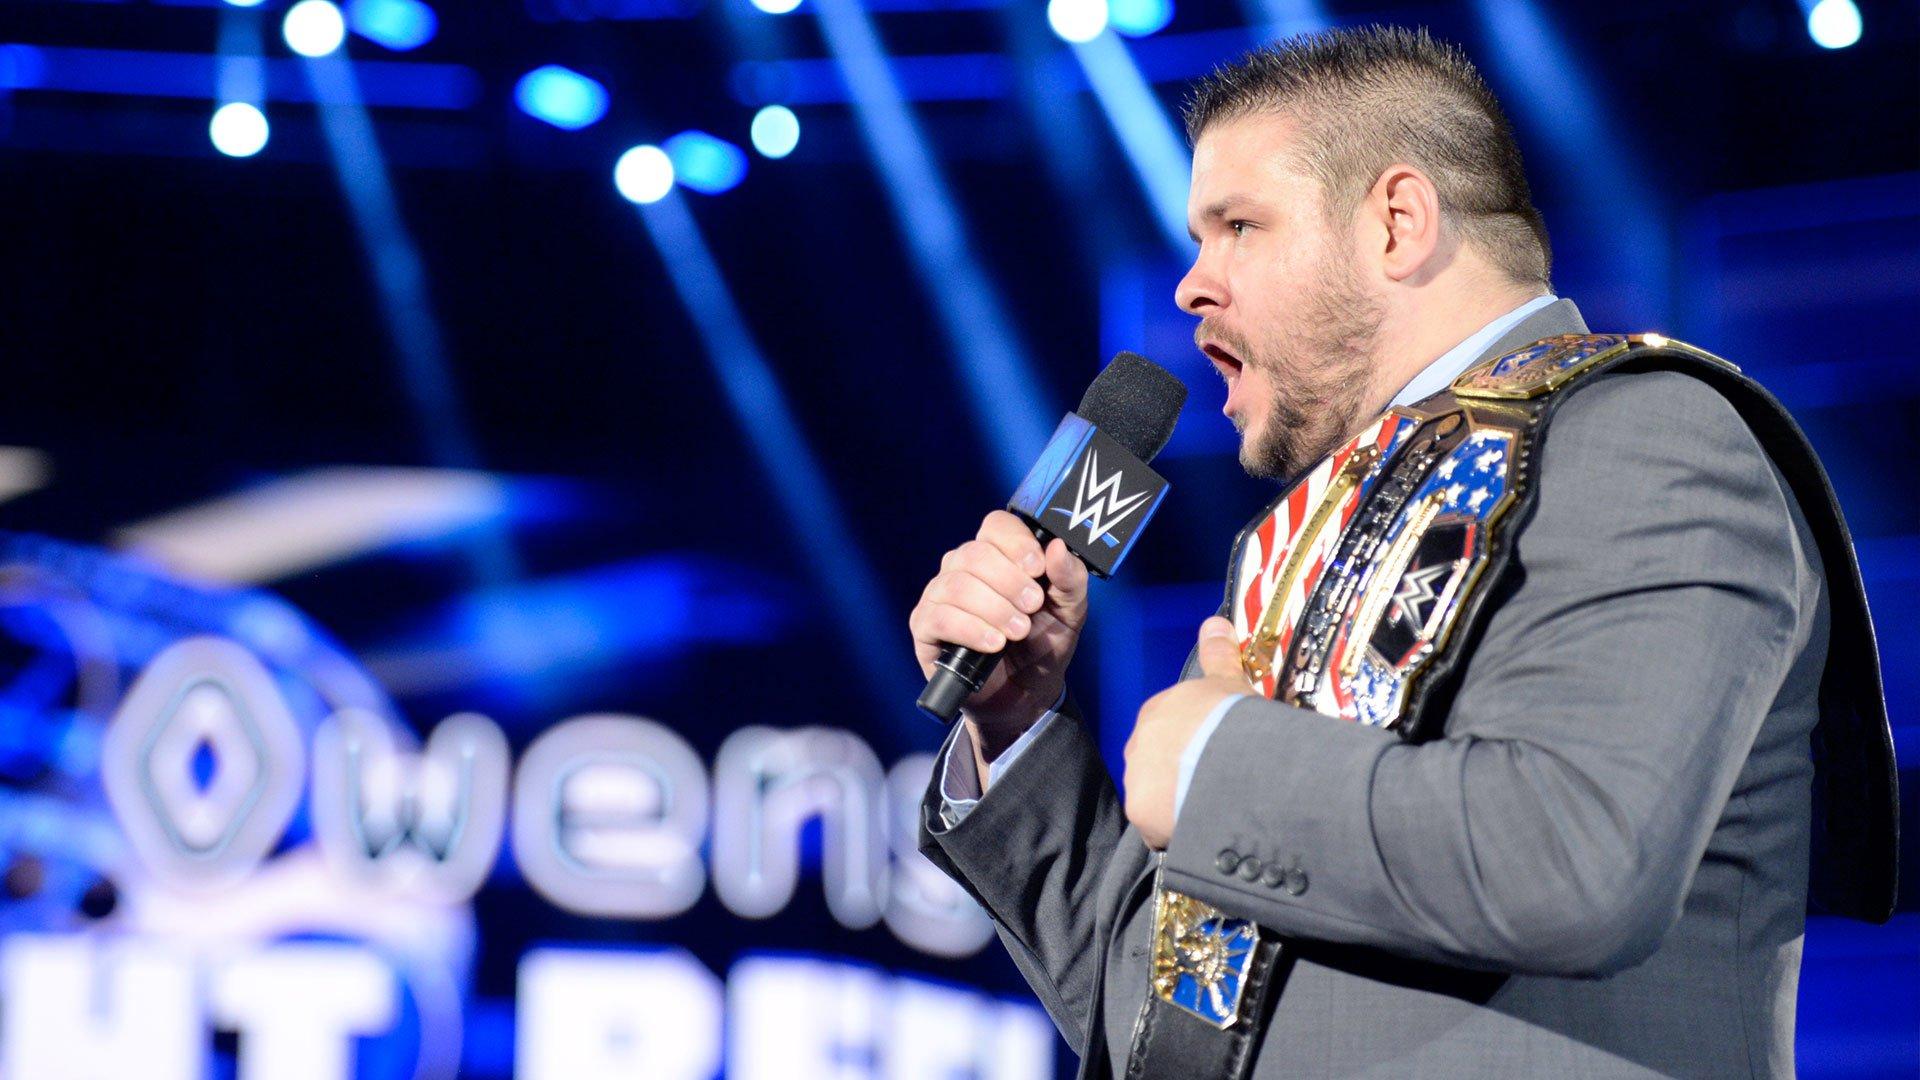 The Highlight Reel de Kevin Owens engendre des tensions entre AJ Styles et Jinder Mahal: SmackDown LIVE, 16 mai 2017